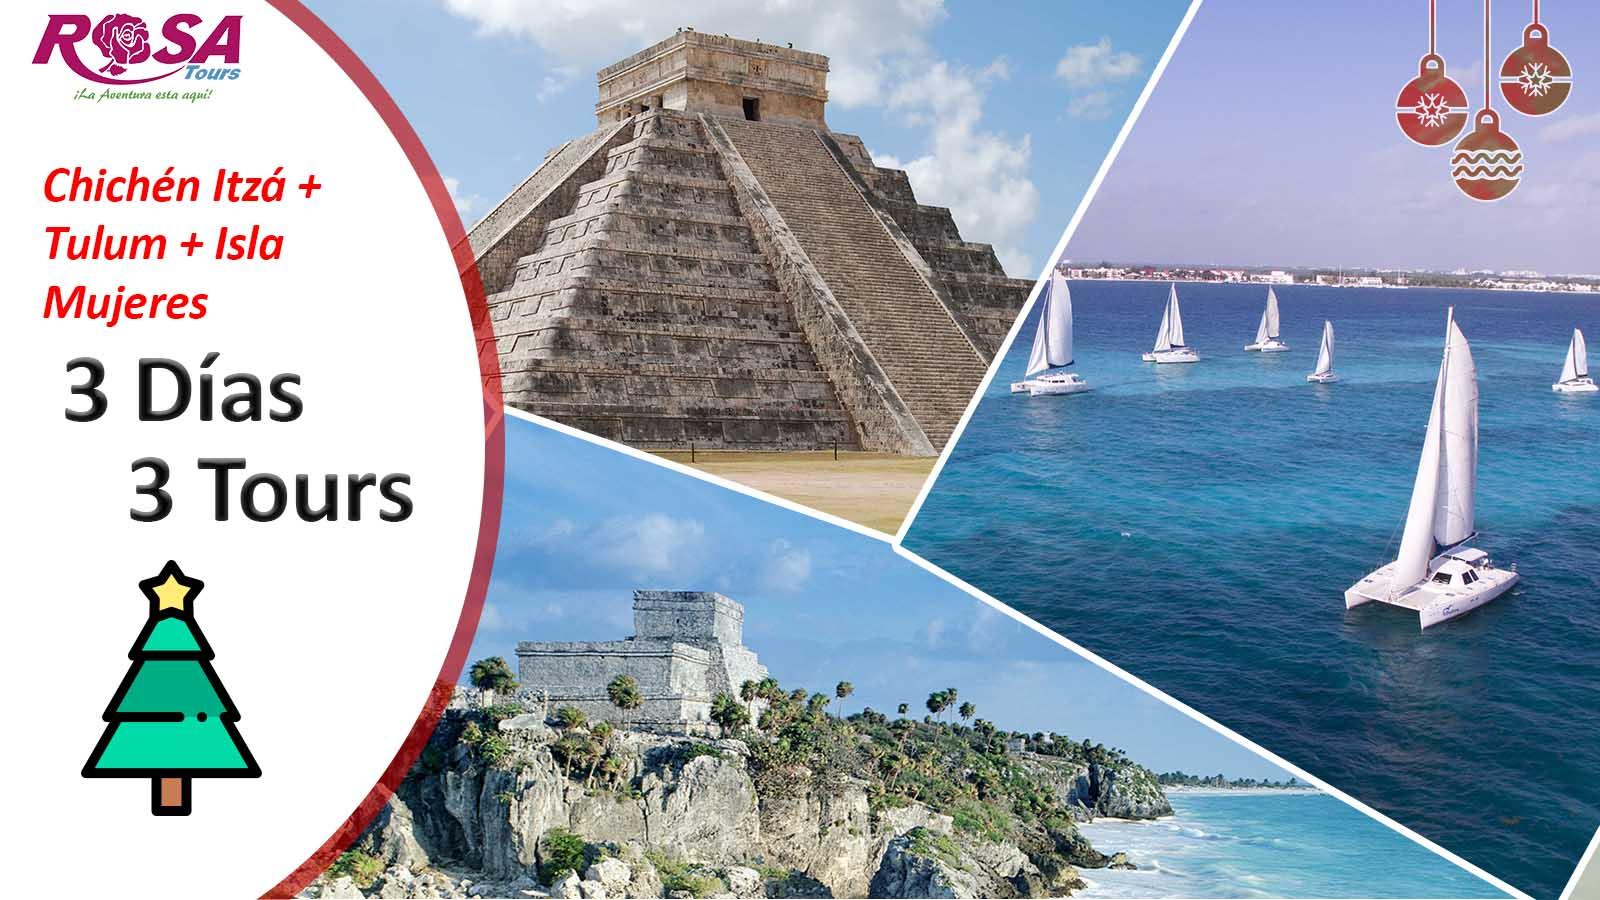 Chichen Itza + Tulum + Isla Mujeres / 3 Días - 3 Tours&IN